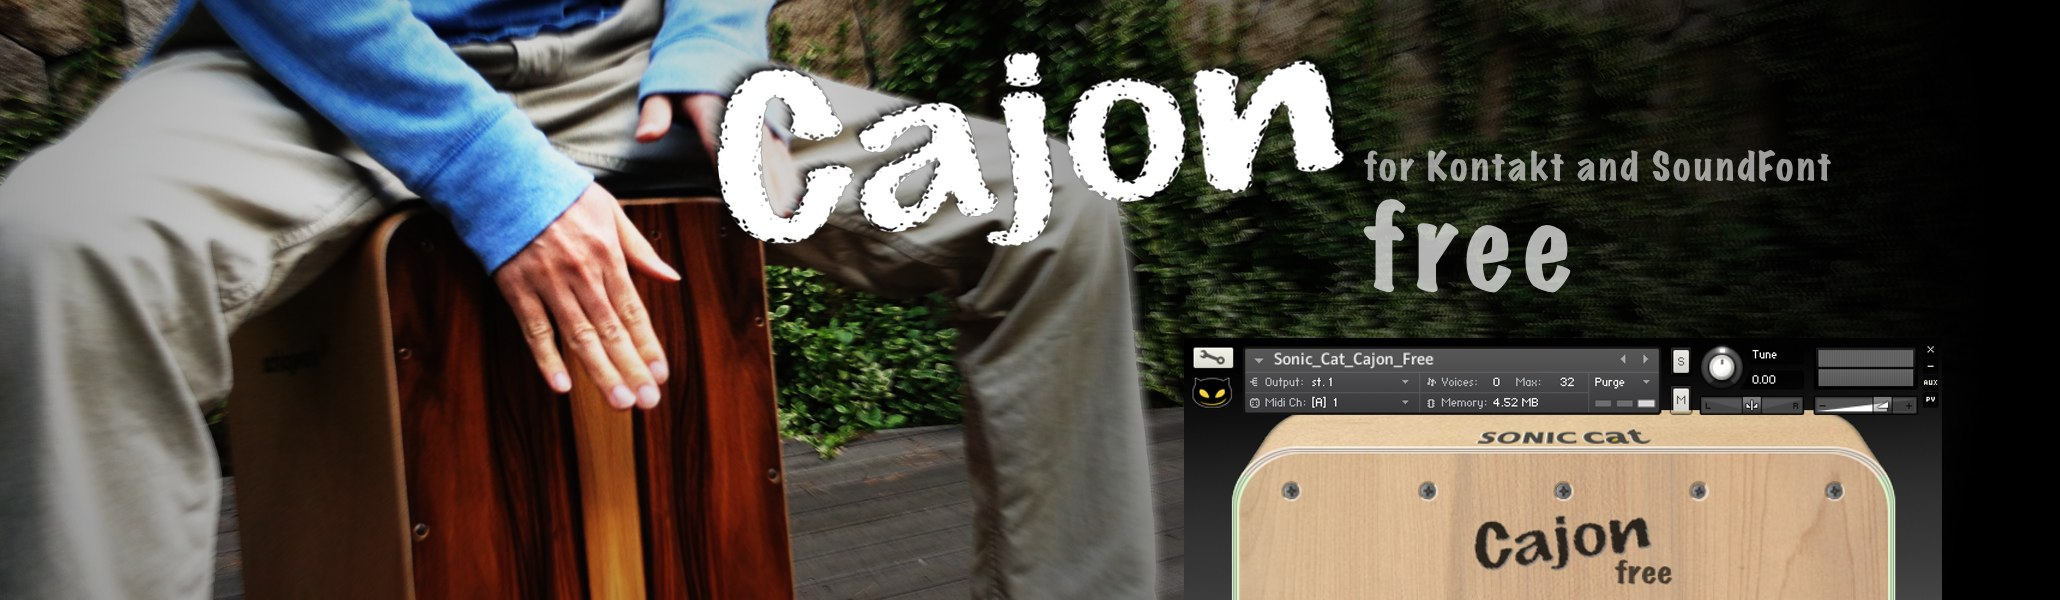 Cajon Free Title Image